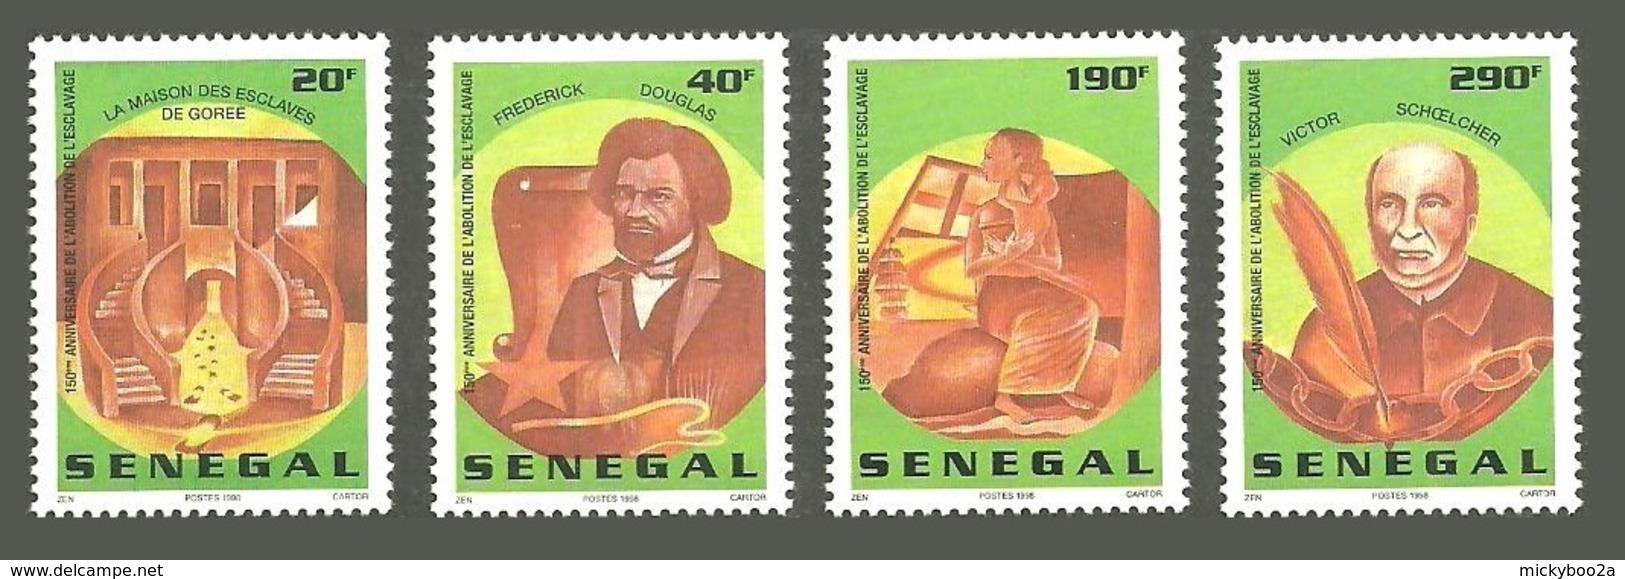 SENEGAL 1998 150TH ANNIVERSARY OF THE ABOLITION OF SLAVERY SET MNH - Senegal (1960-...)